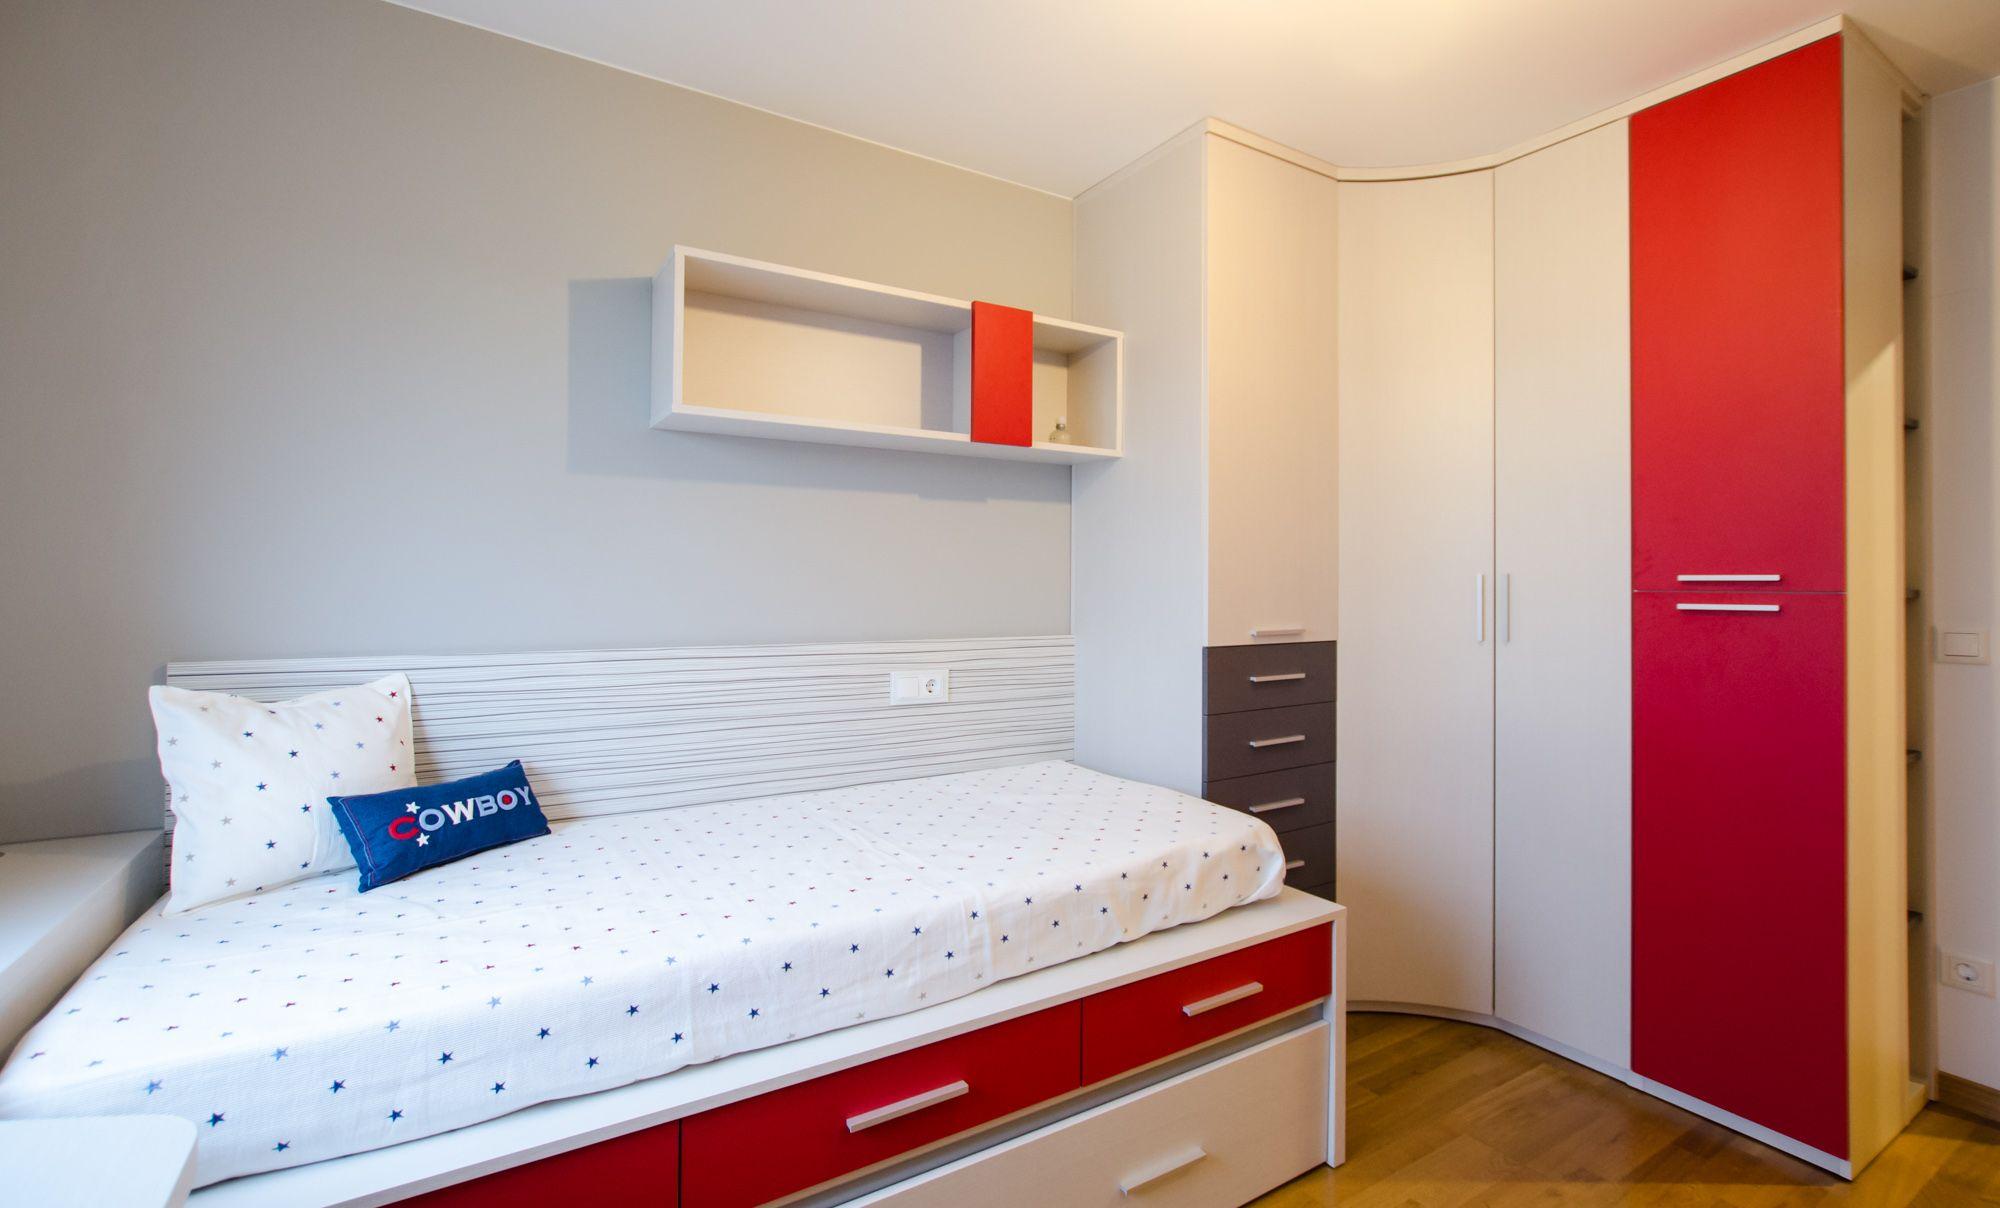 Habitaci n juvenil moderna de dise o a medida con el friso - Diseno habitacion juvenil ...